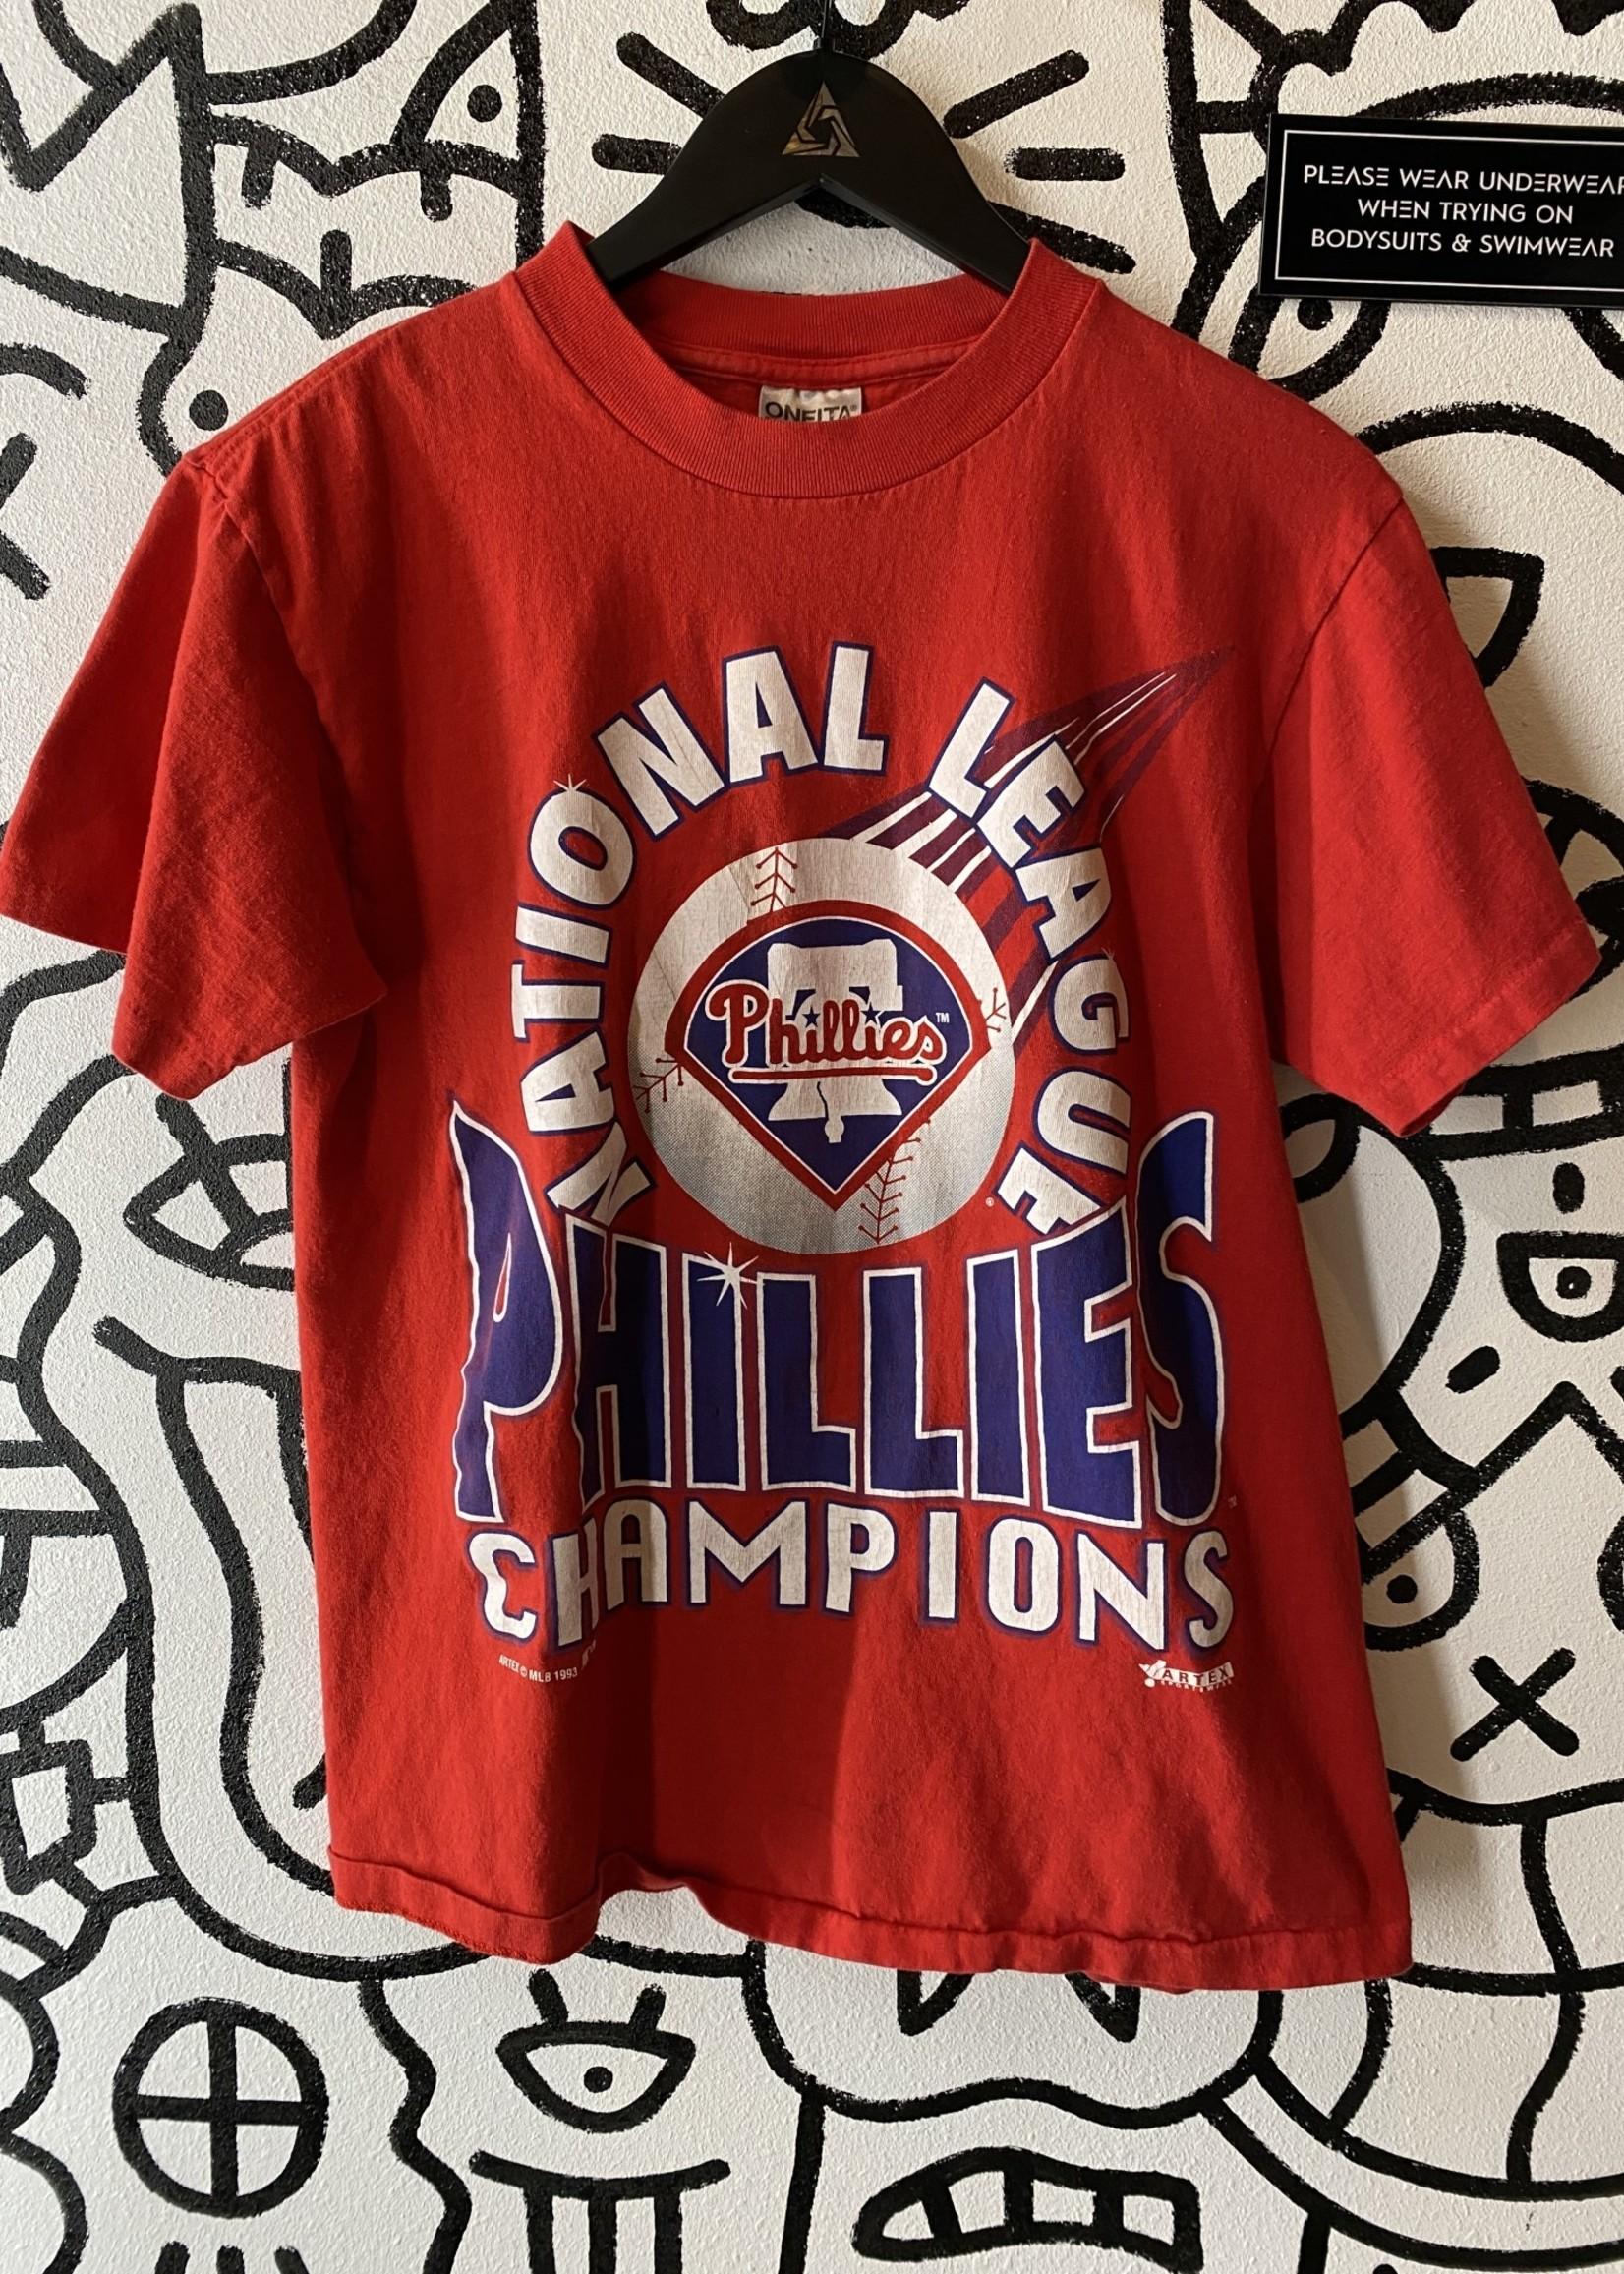 93 Phillies Champions Vintage Tee M